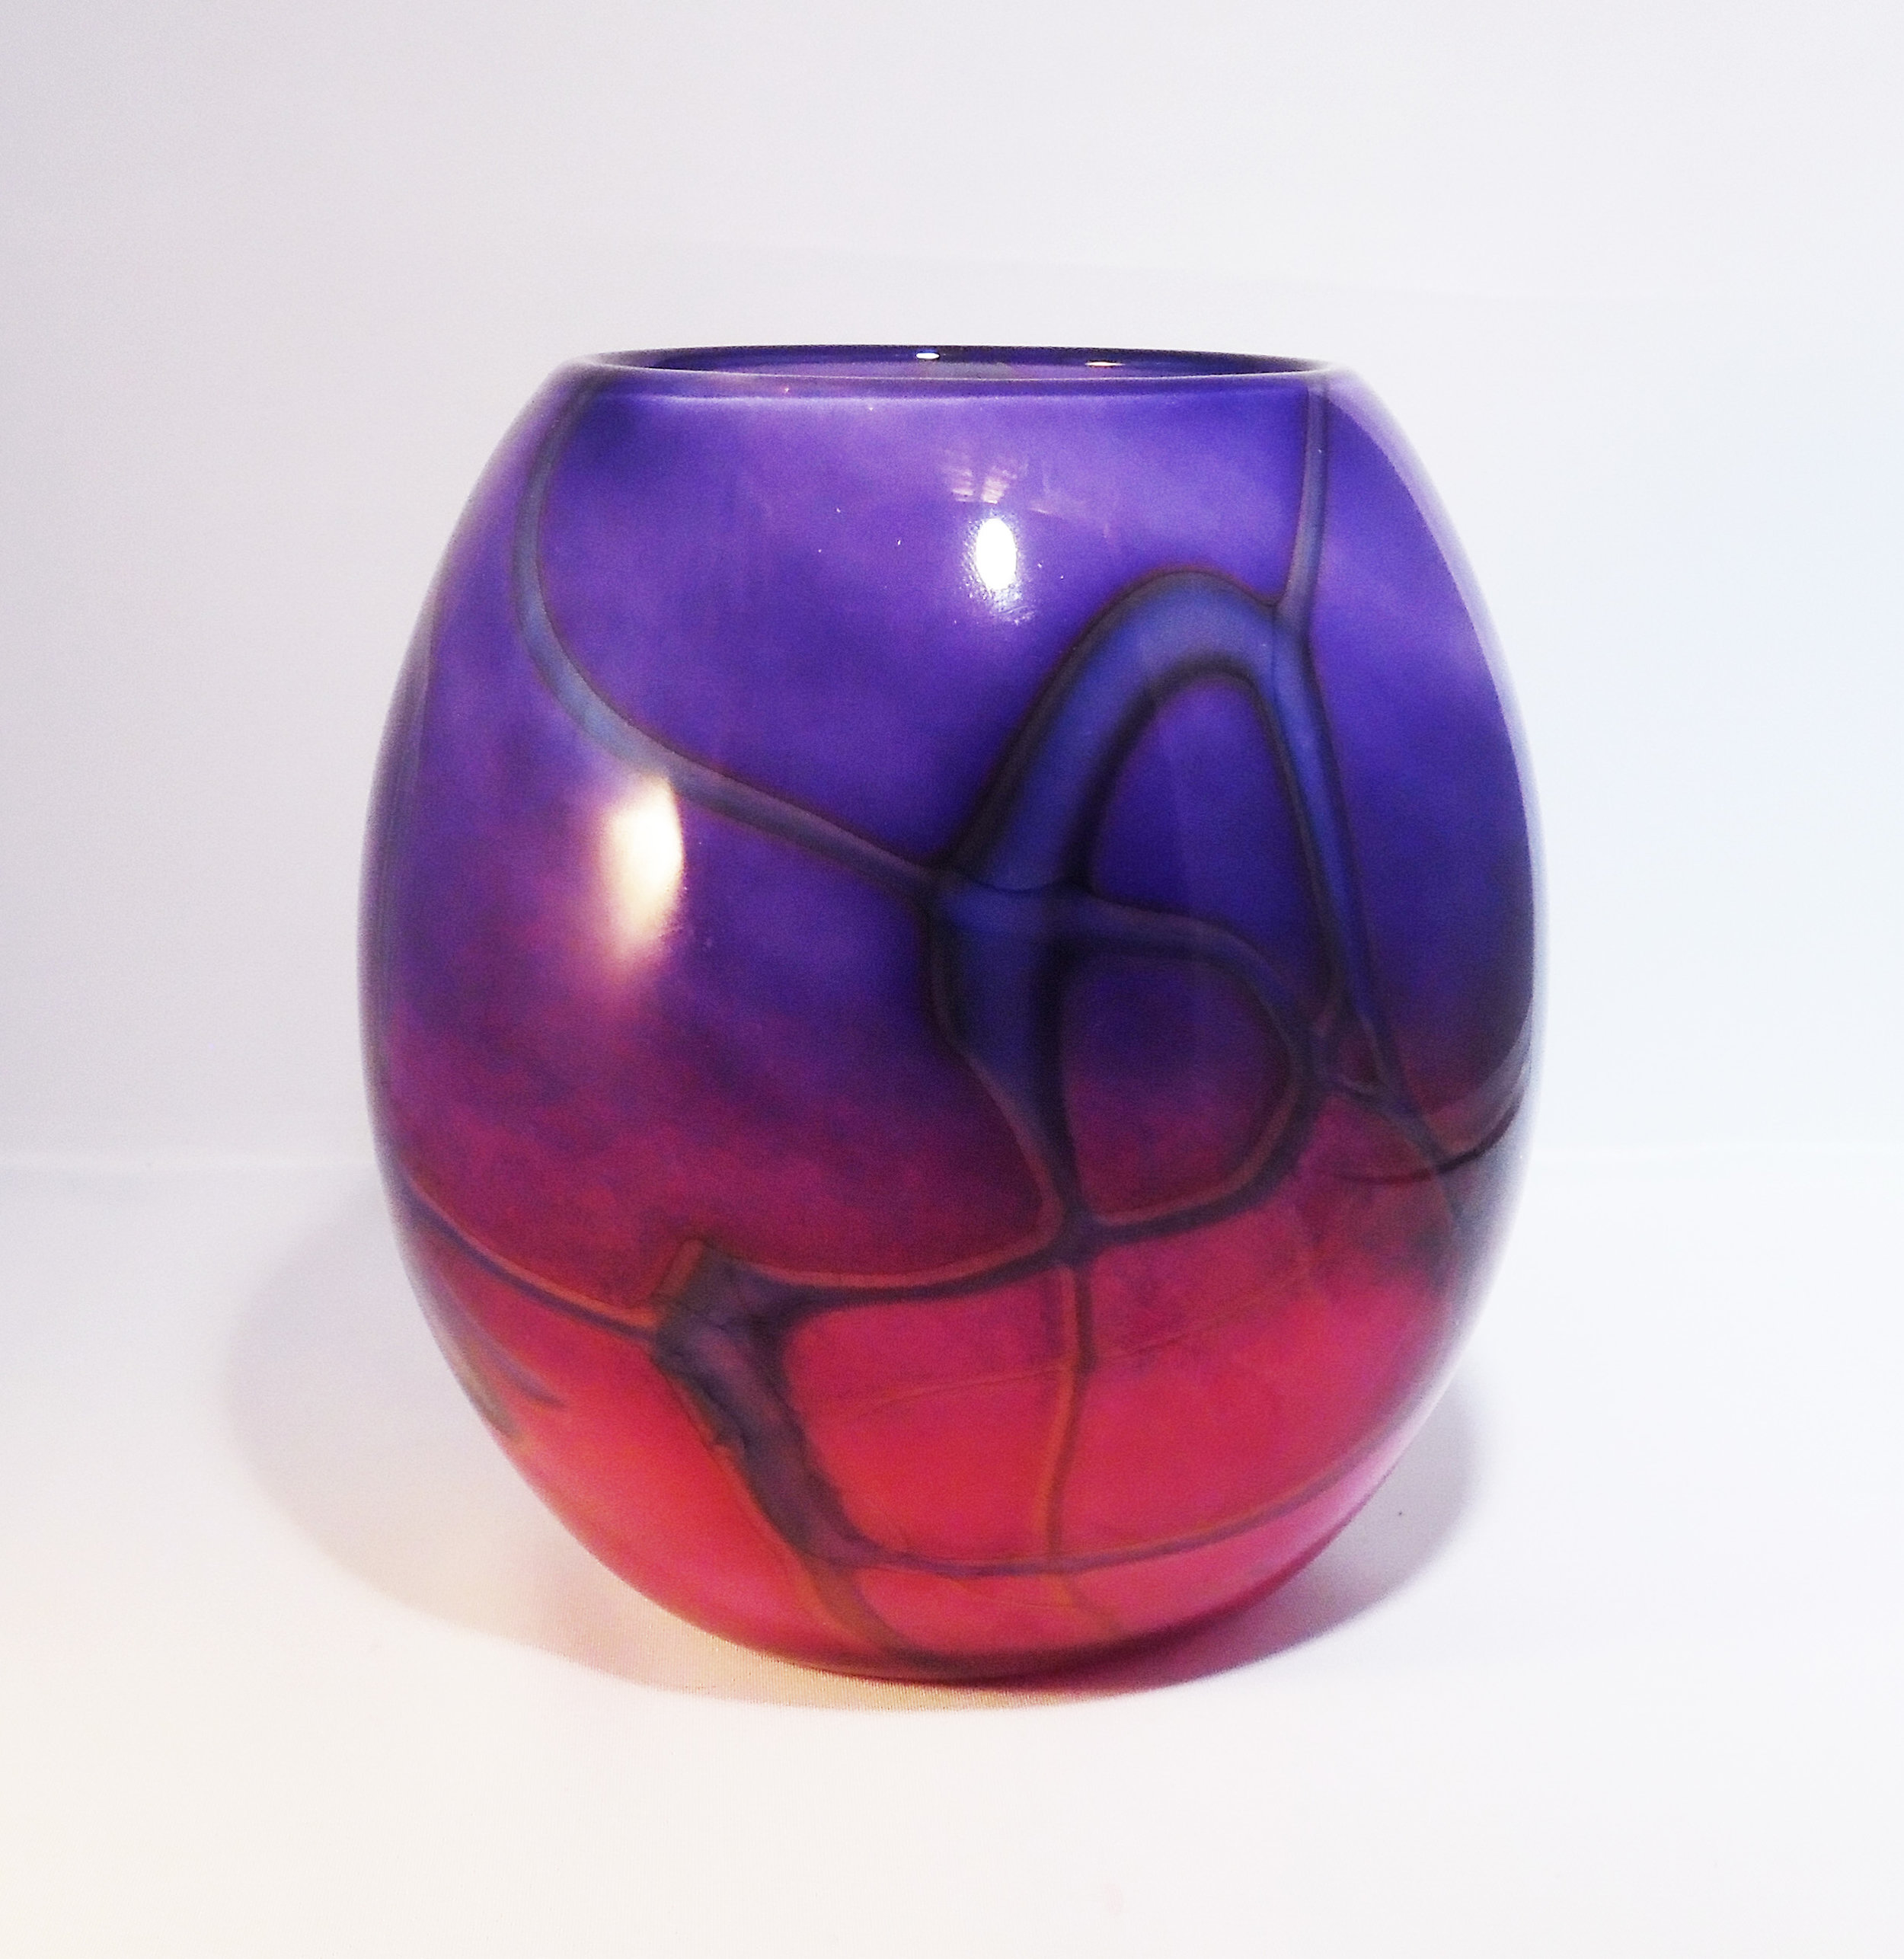 Tulip Bowl by Nicole Tremblay